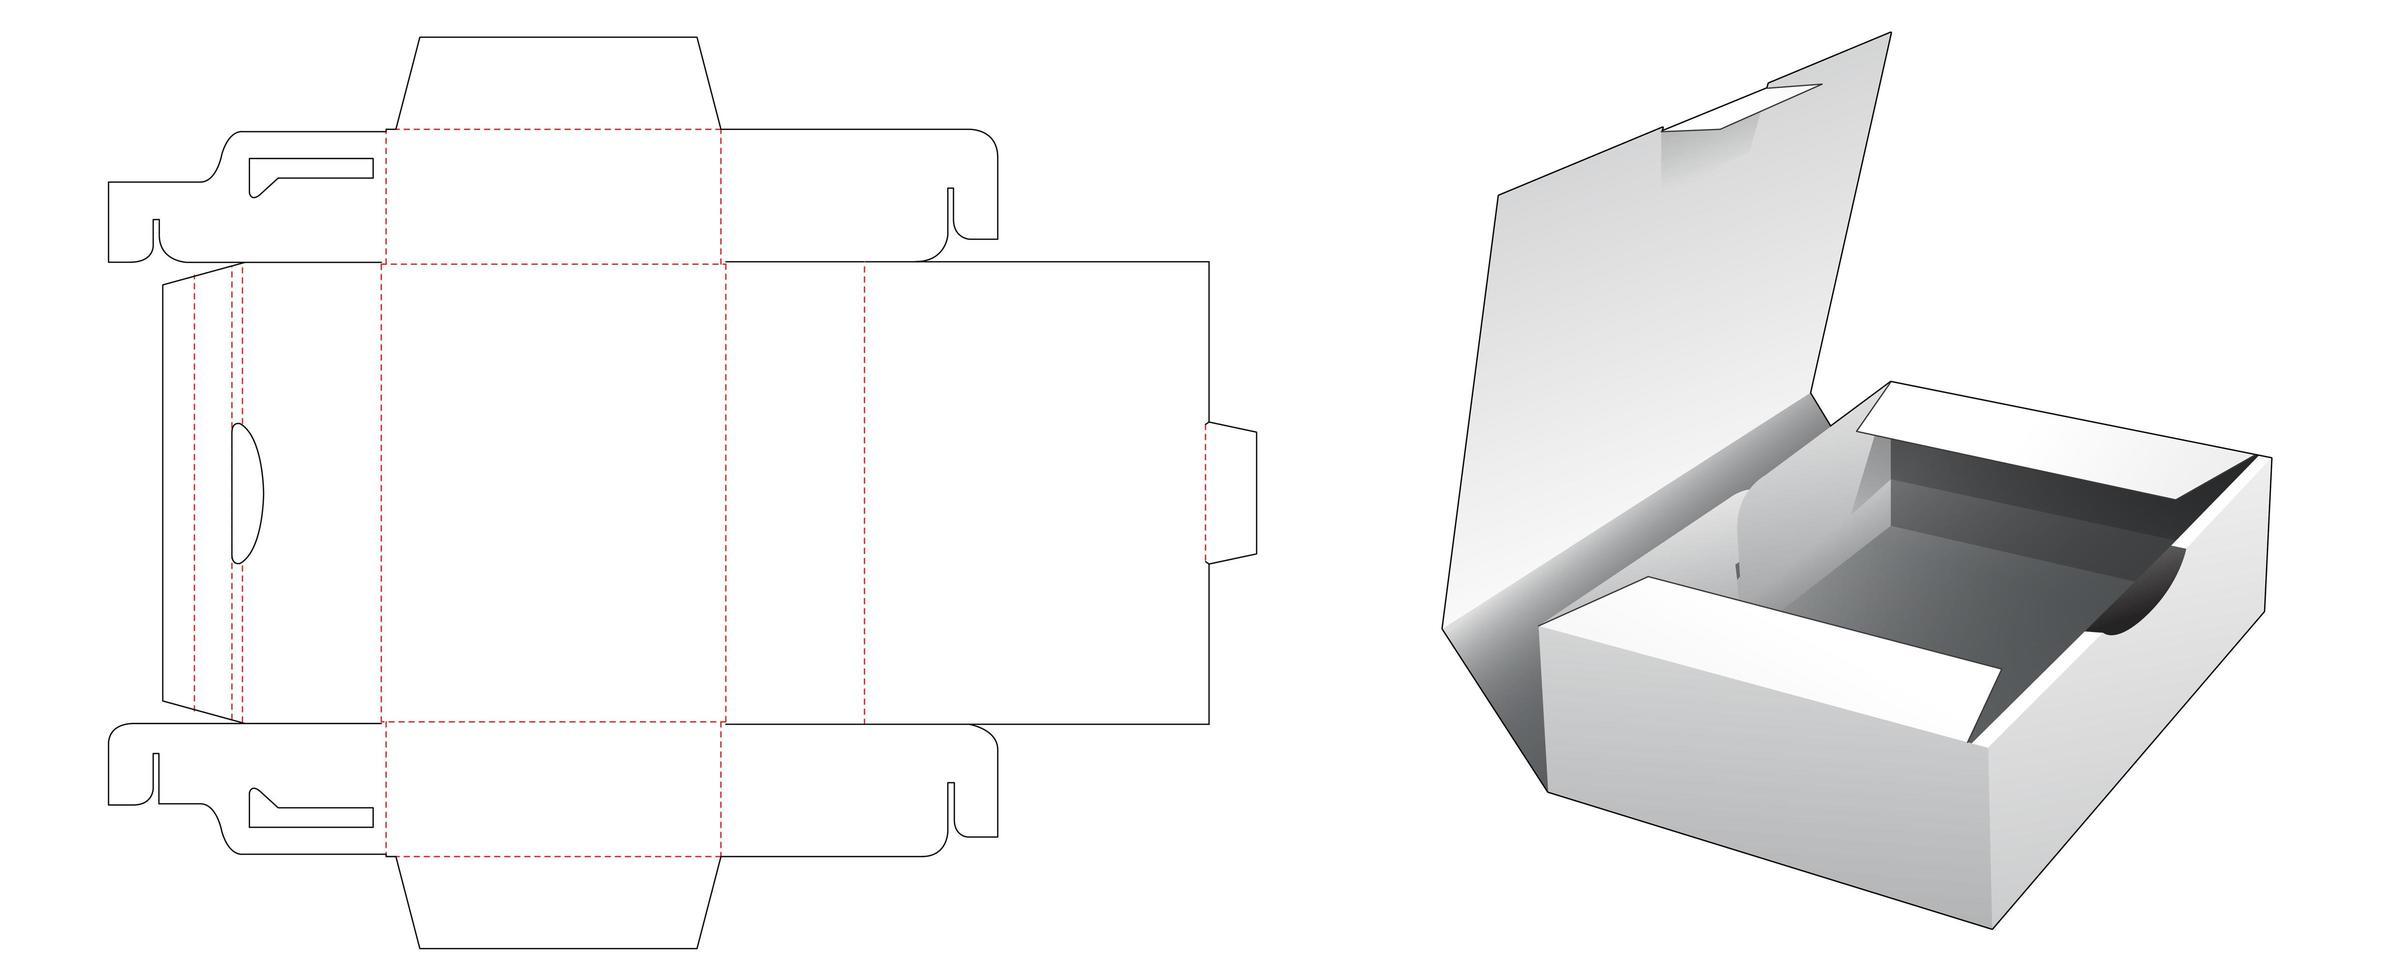 1 Stück Kuchenbehälter Box vektor